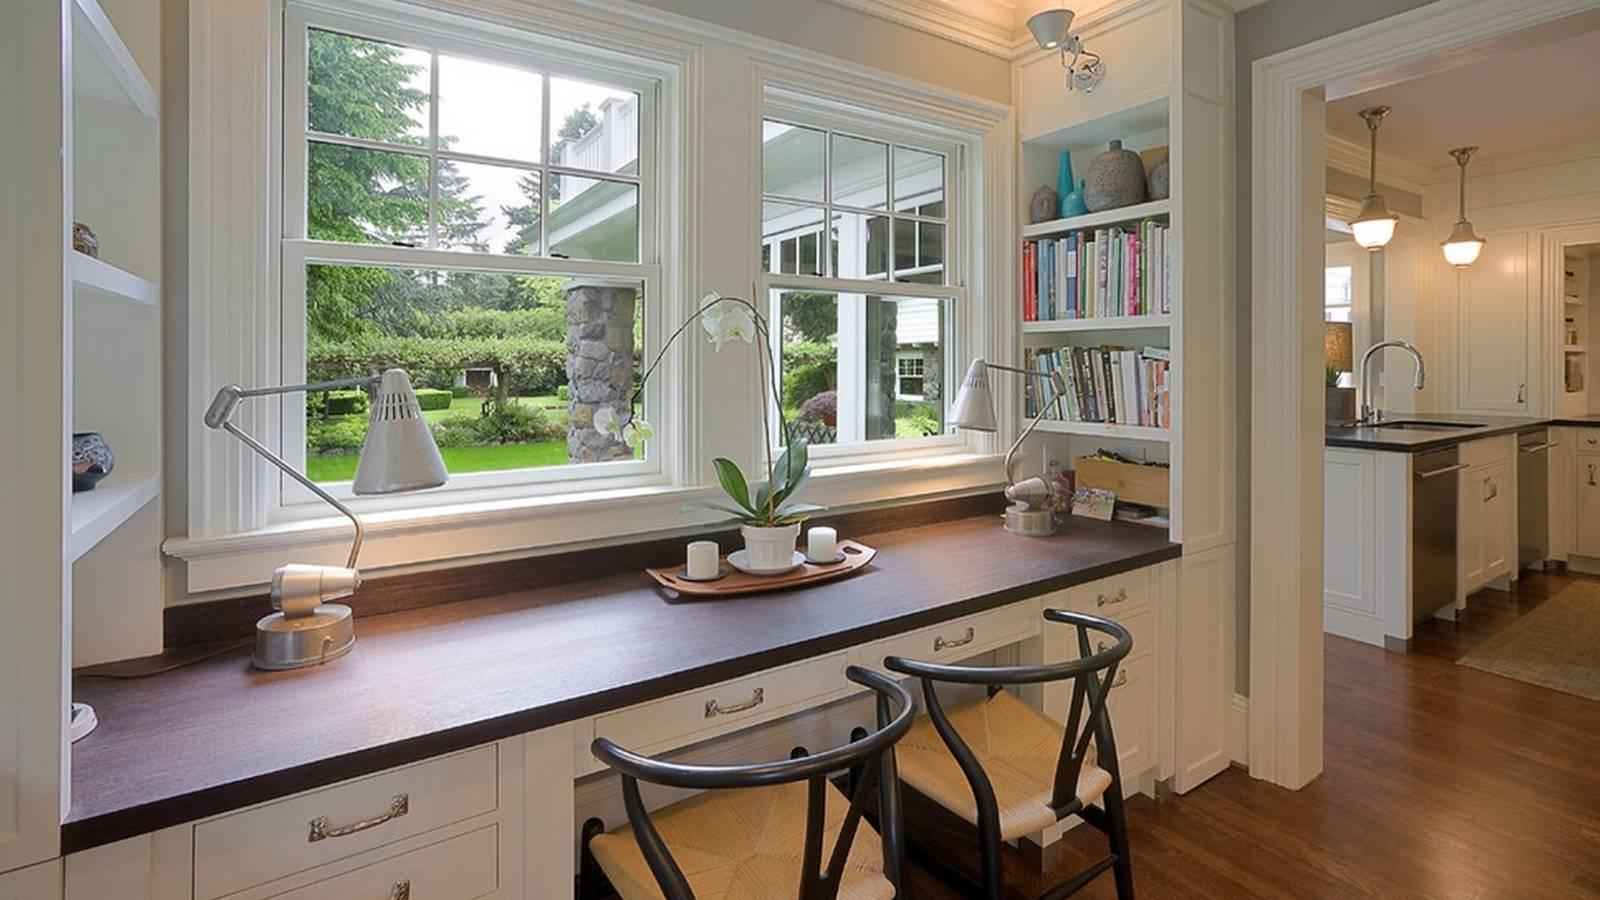 Home Renovation Tips And Inspirational Photos